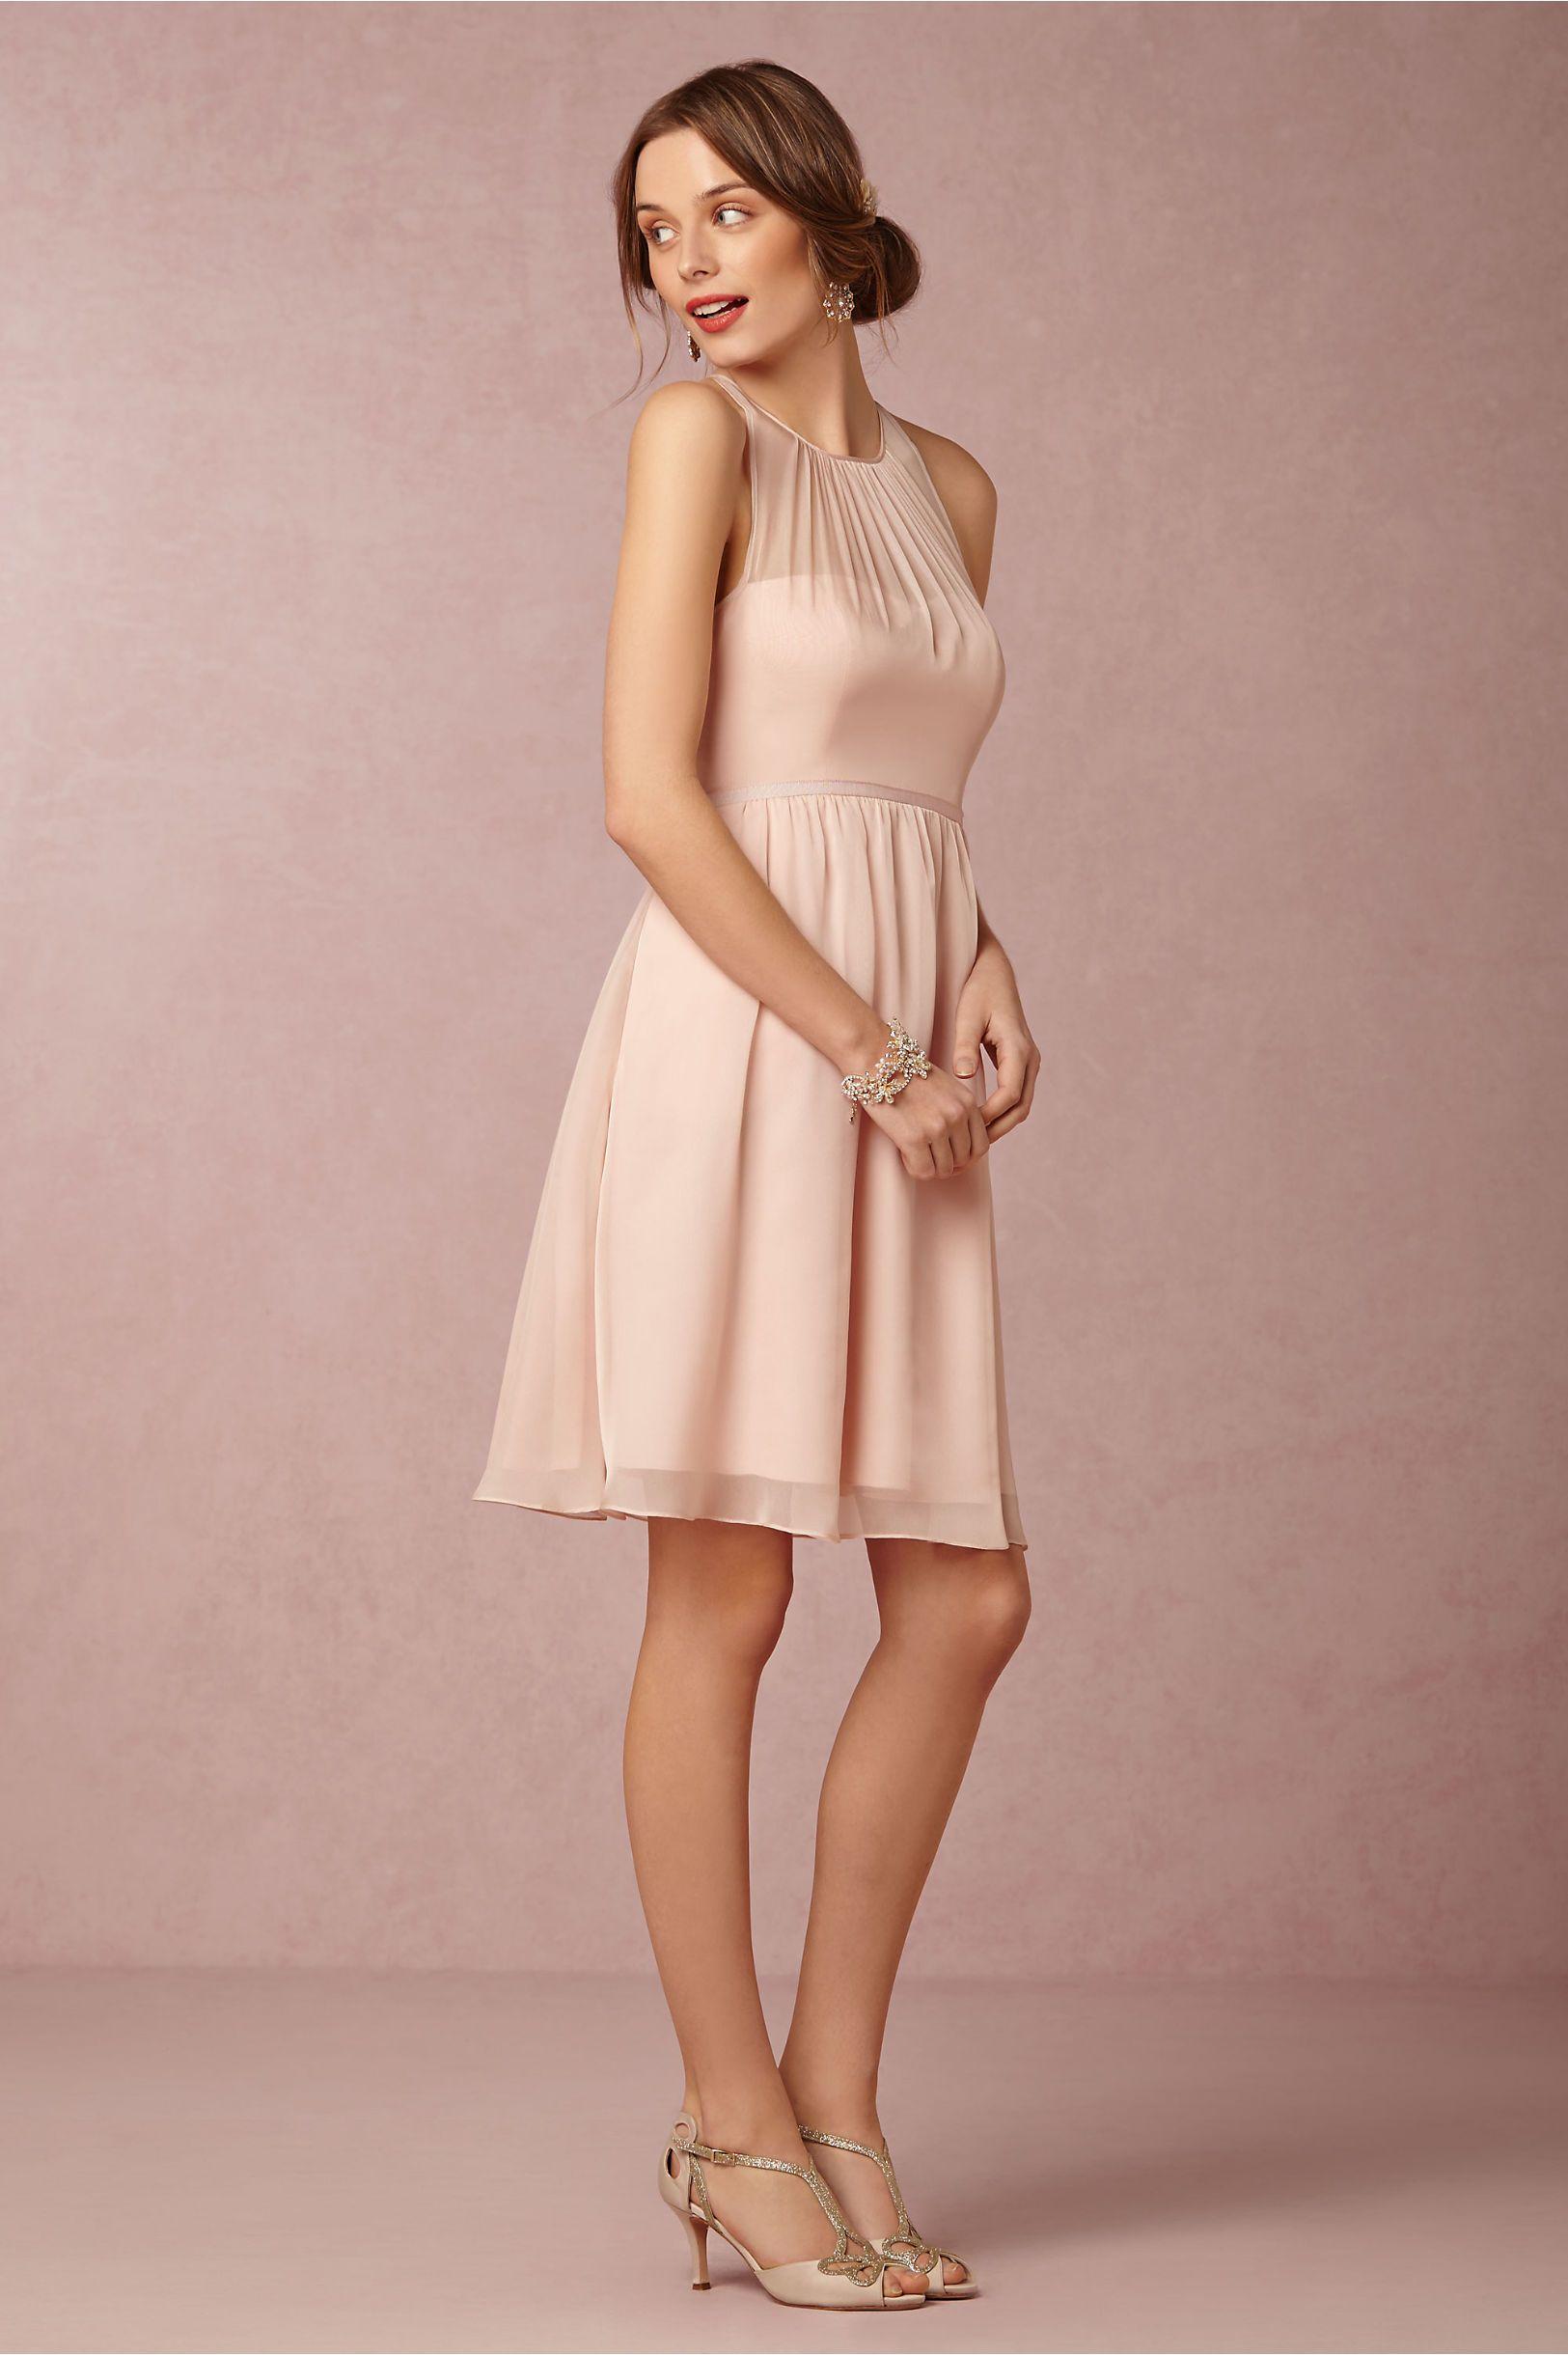 Georgina Bridesmaid Dress in blush from @BHLDN | Wedding Inspo ...